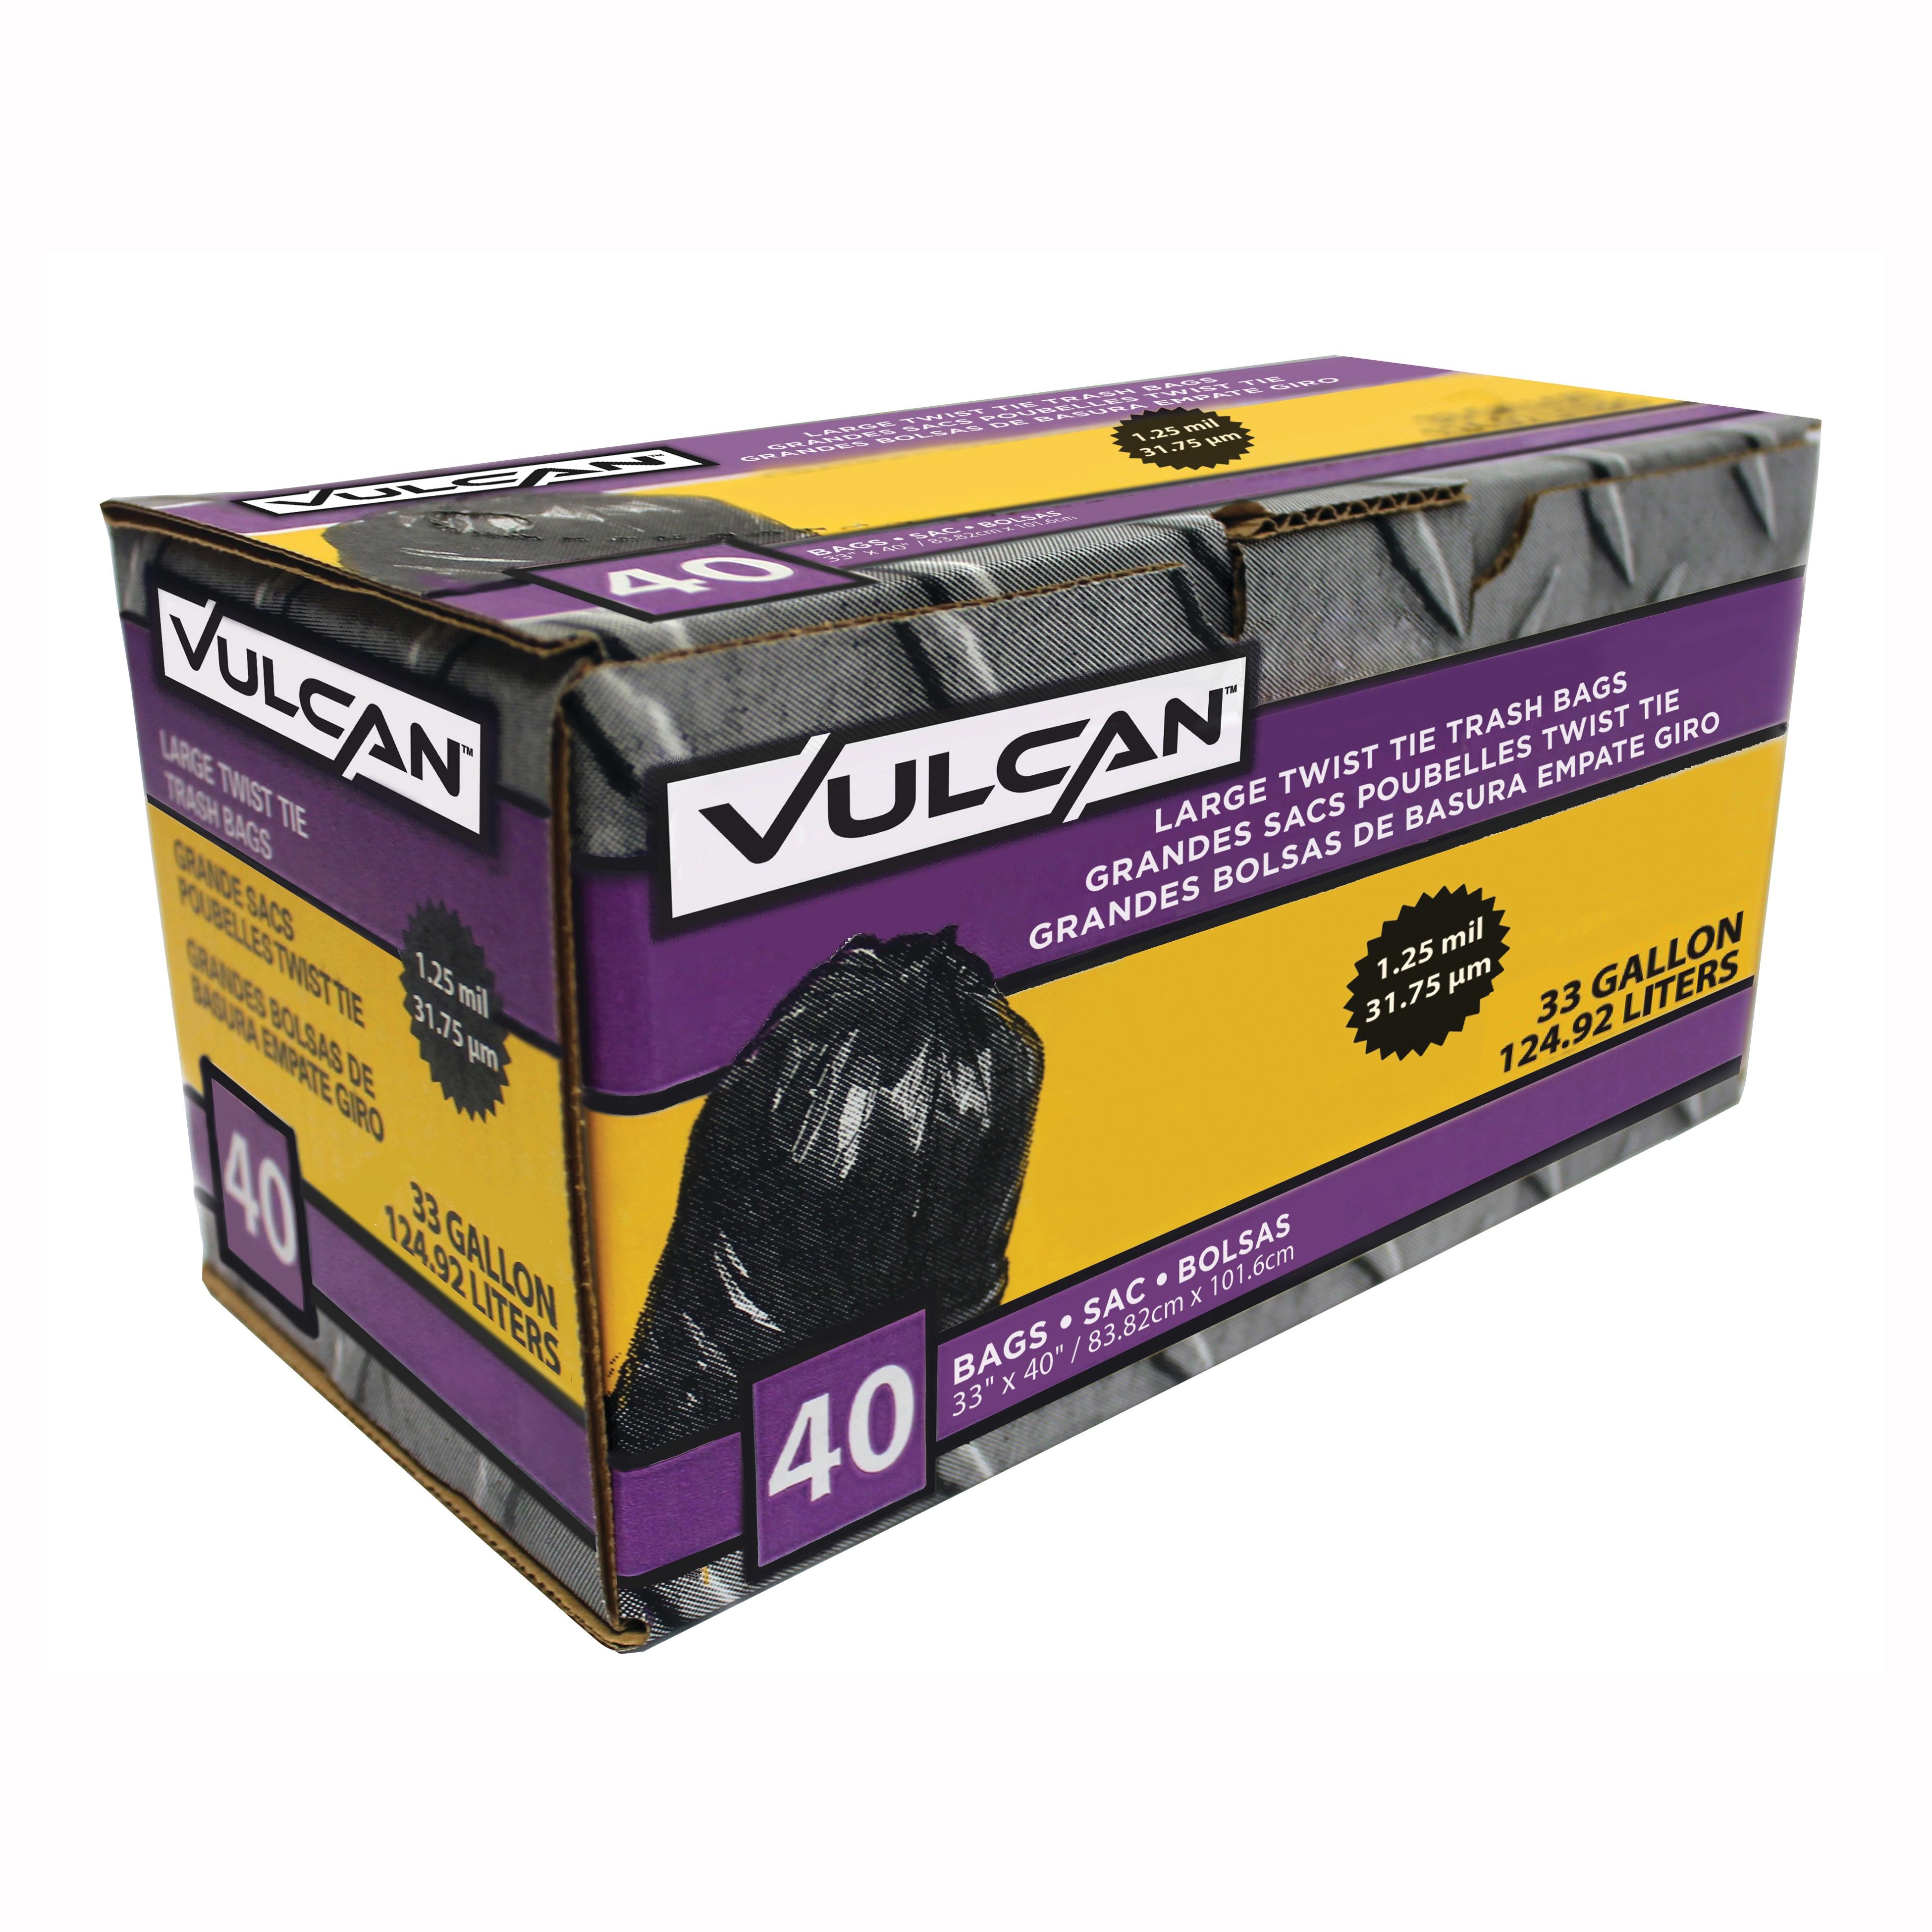 Picture of VULCAN FG-03812-11 Trash Bag, 33 gal Capacity, Black